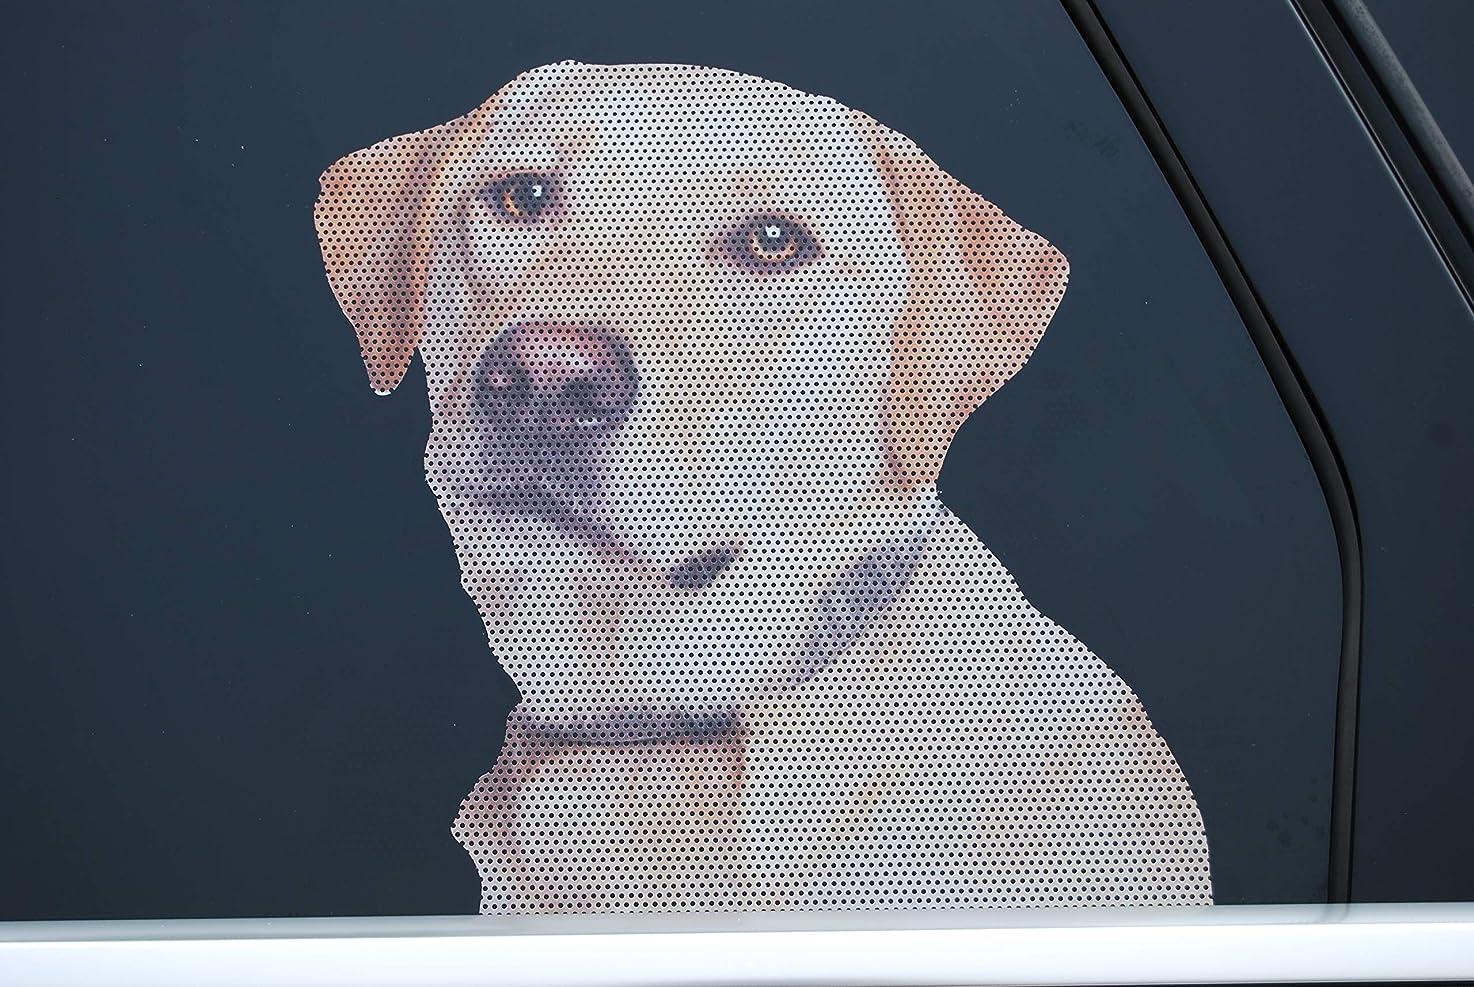 Doggie in the Window car and truck window dog decal - Yellow Labrador Retriever